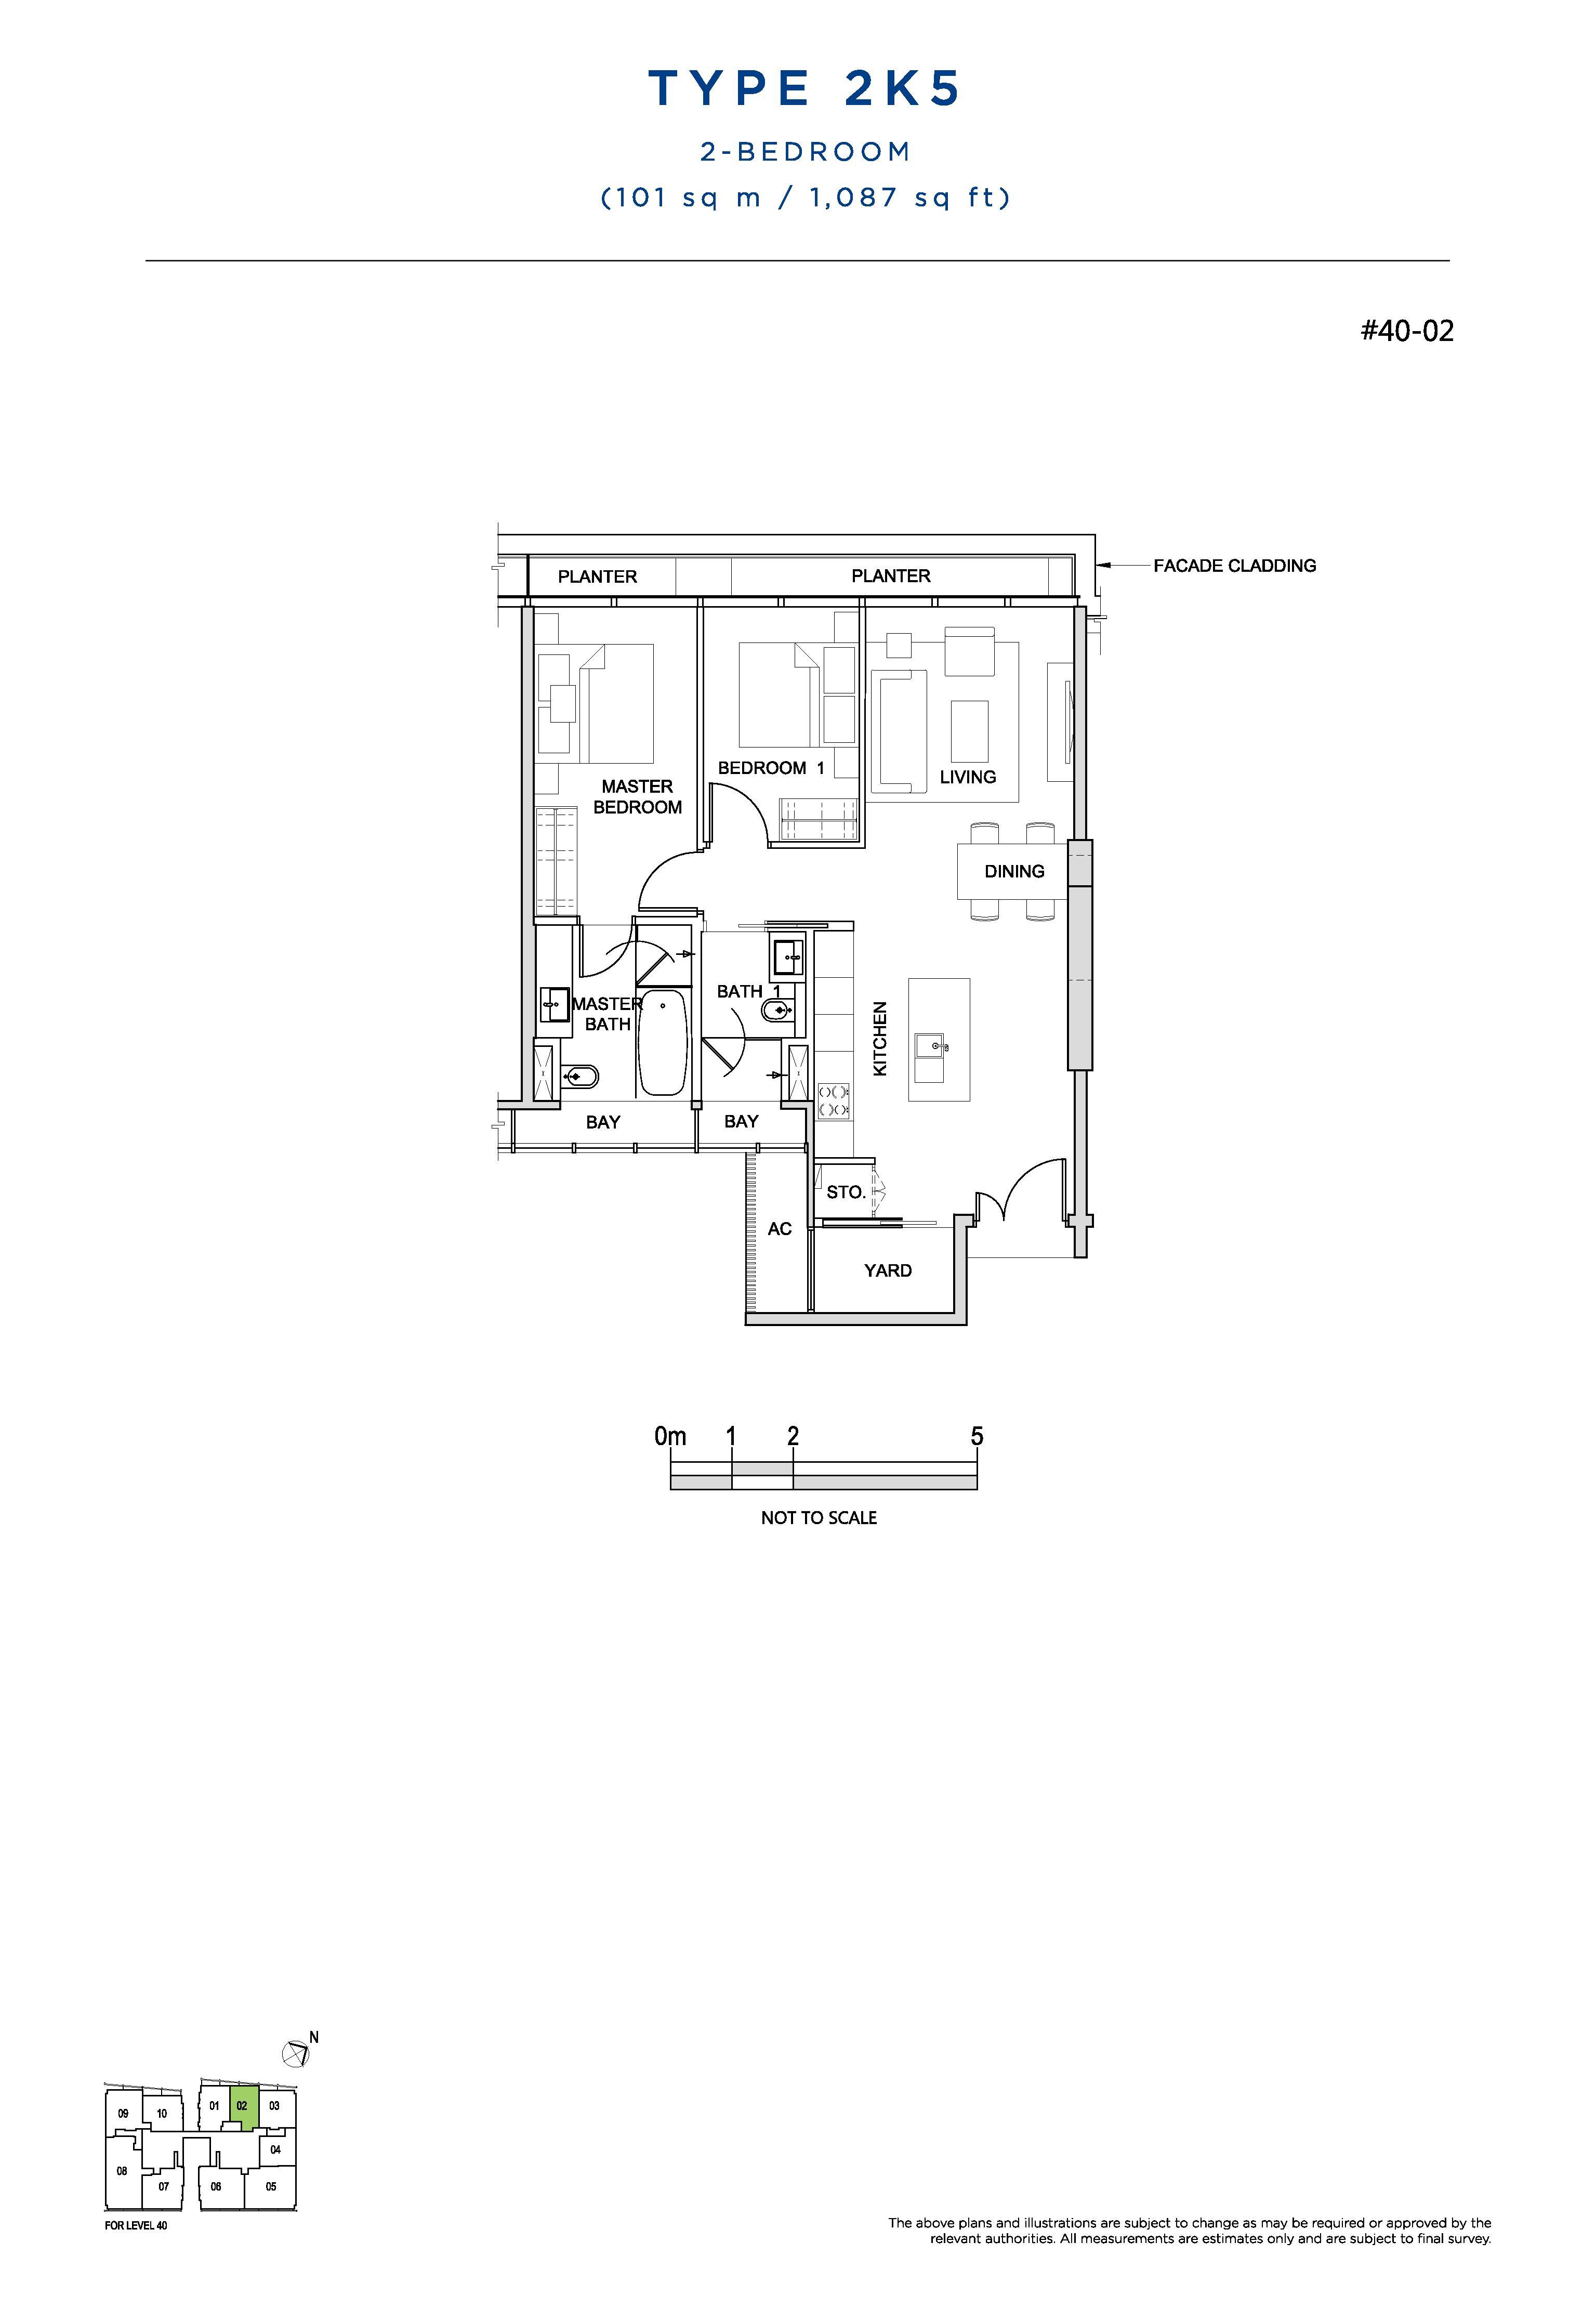 South Beach Residences 2 Bedroom Floor Plans Type 2K5